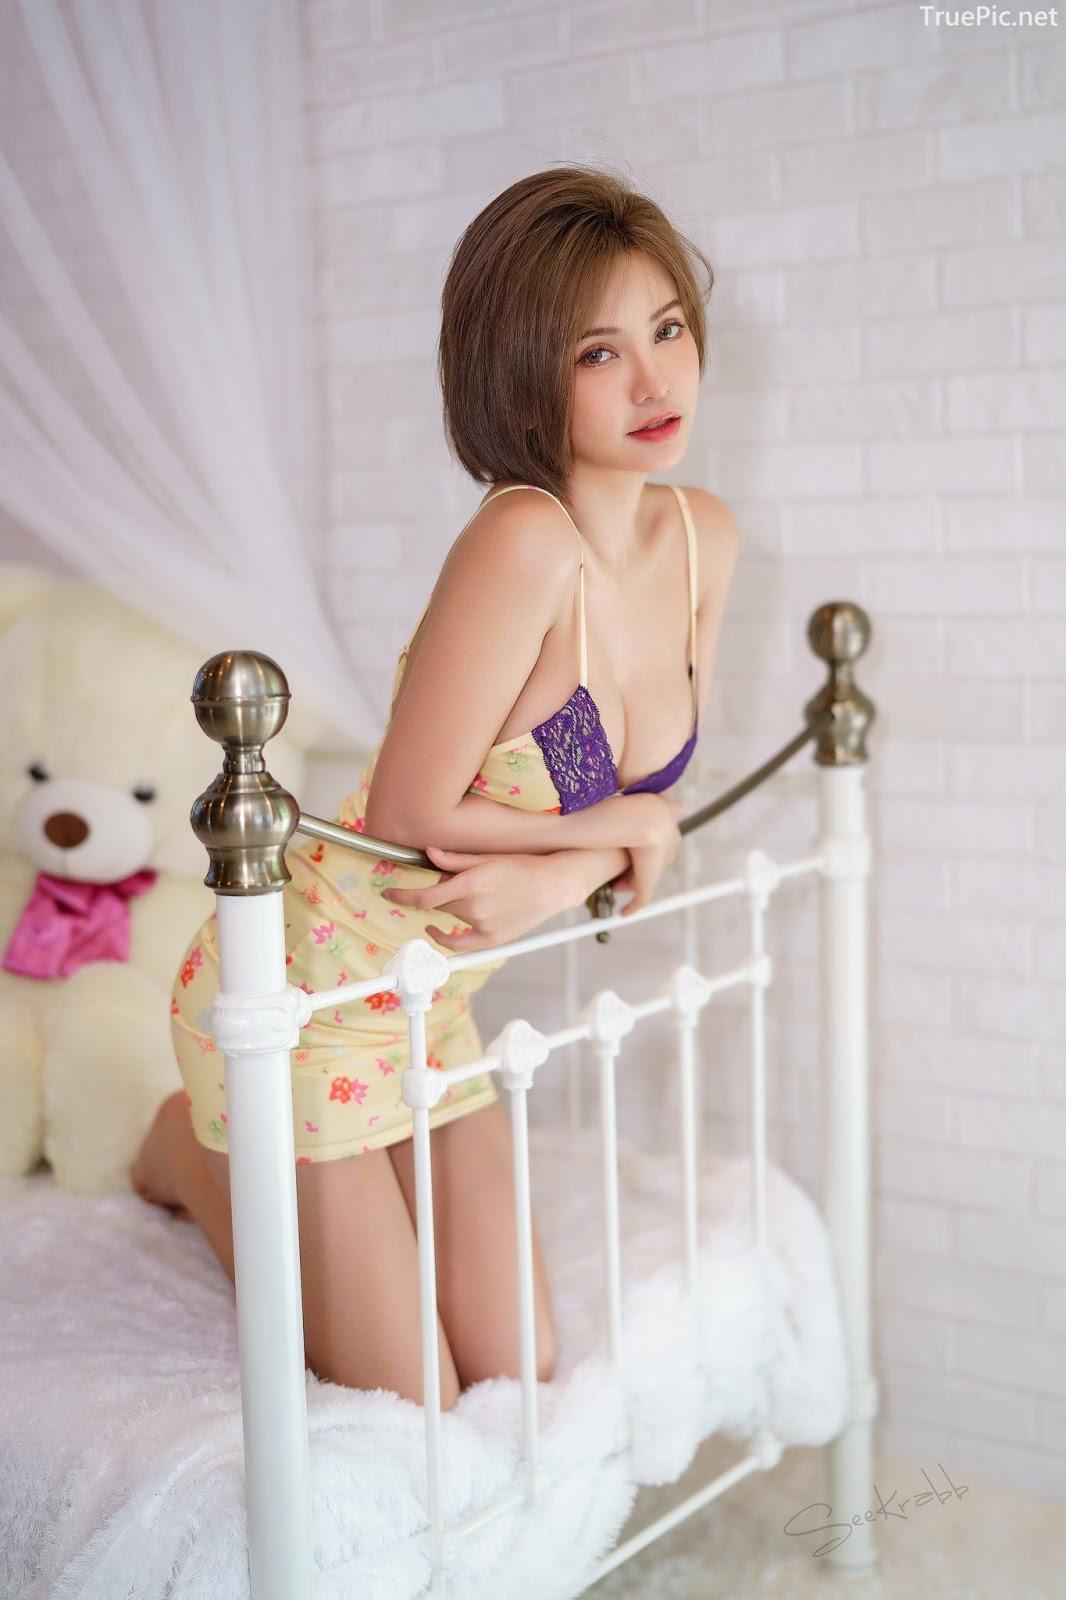 Thailand sexy model - Sutasinee Siriruke - Sleepwear and Lingerie Set - TruePic.net - Picture 9